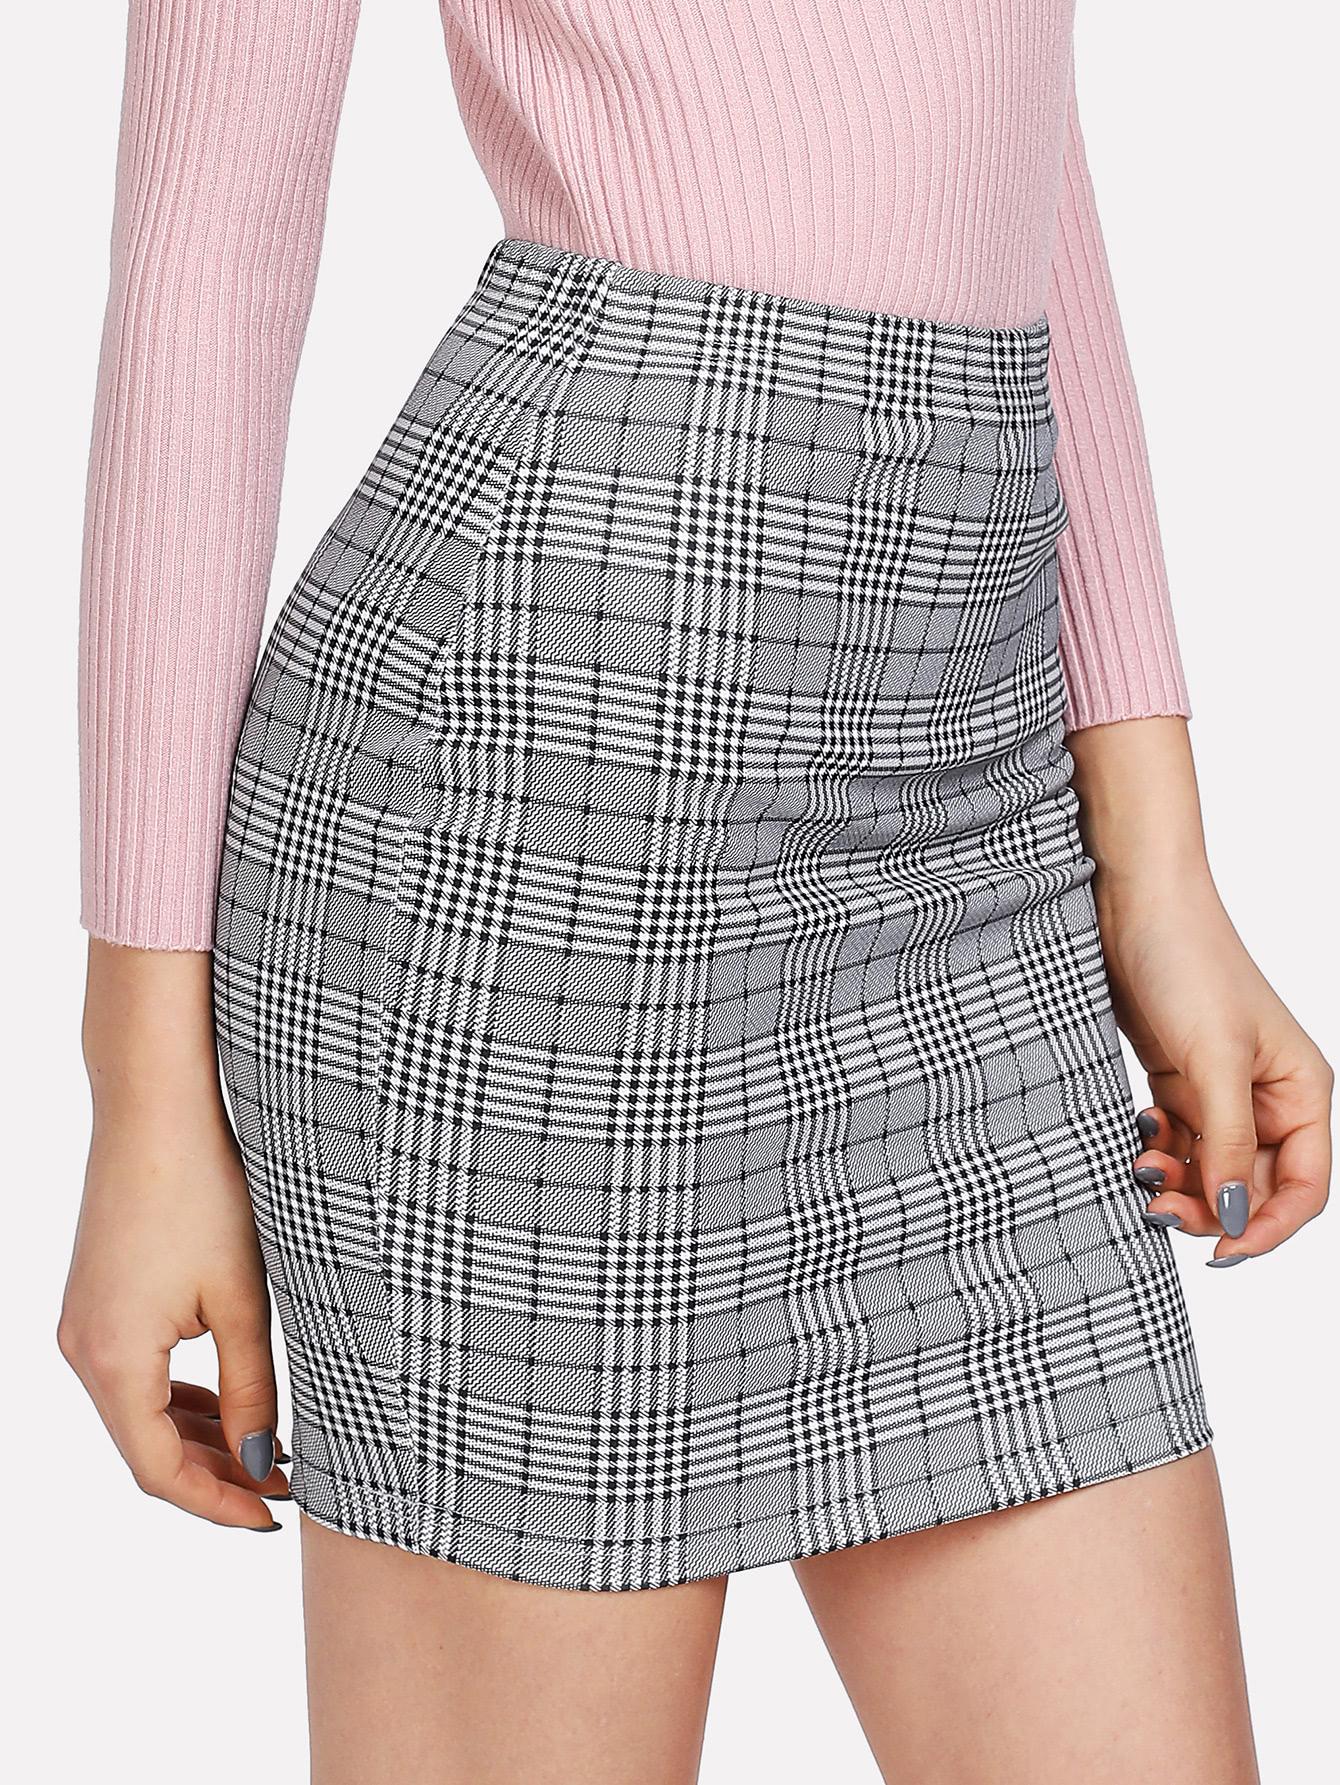 Plaid Print Bodycon Skirt stripe panel plaid bodycon skirt